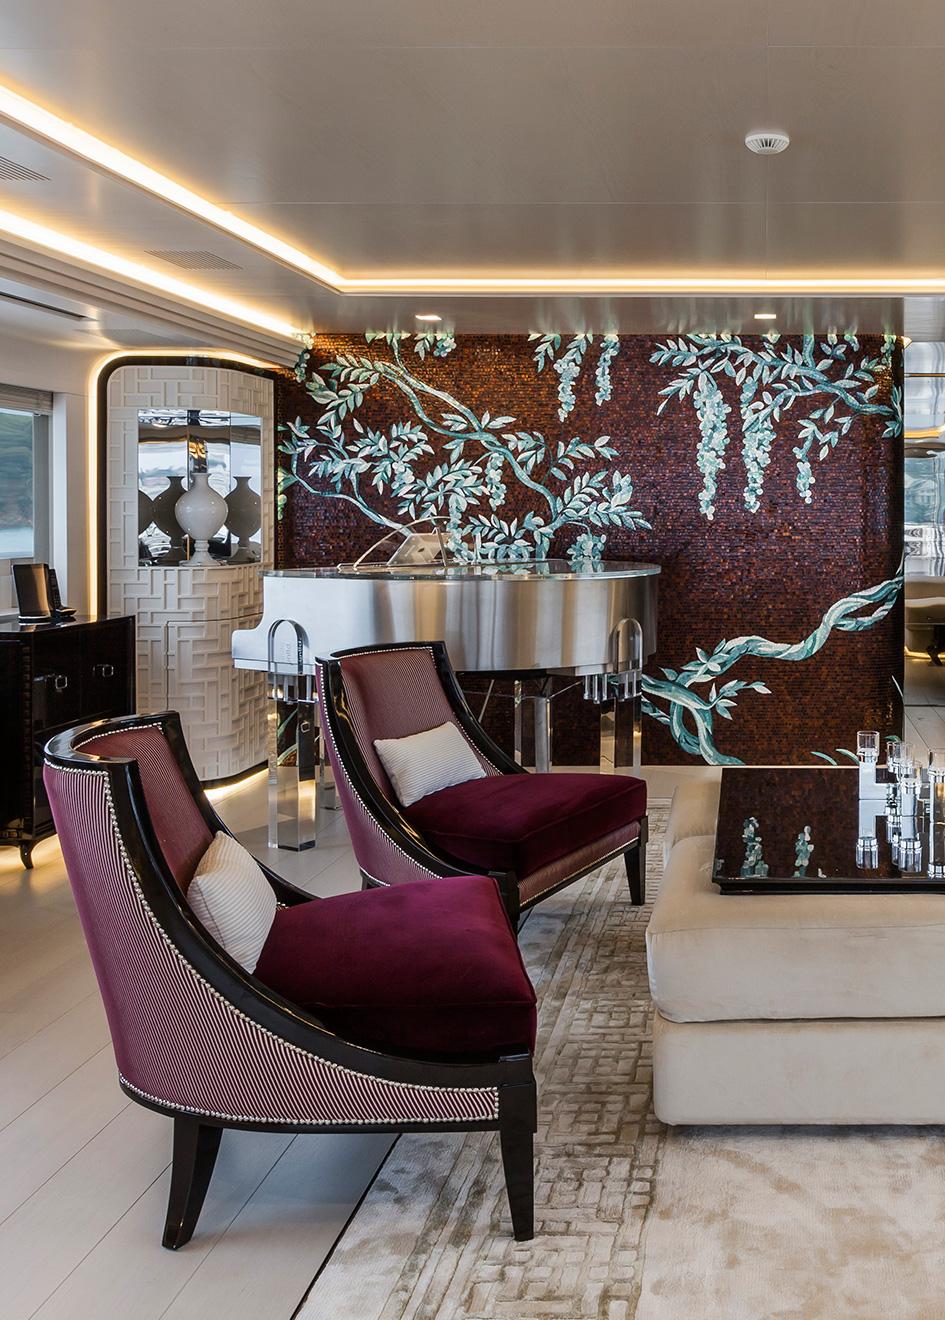 the-upper-saloon-of-rossinavi-super-yacht-polaris